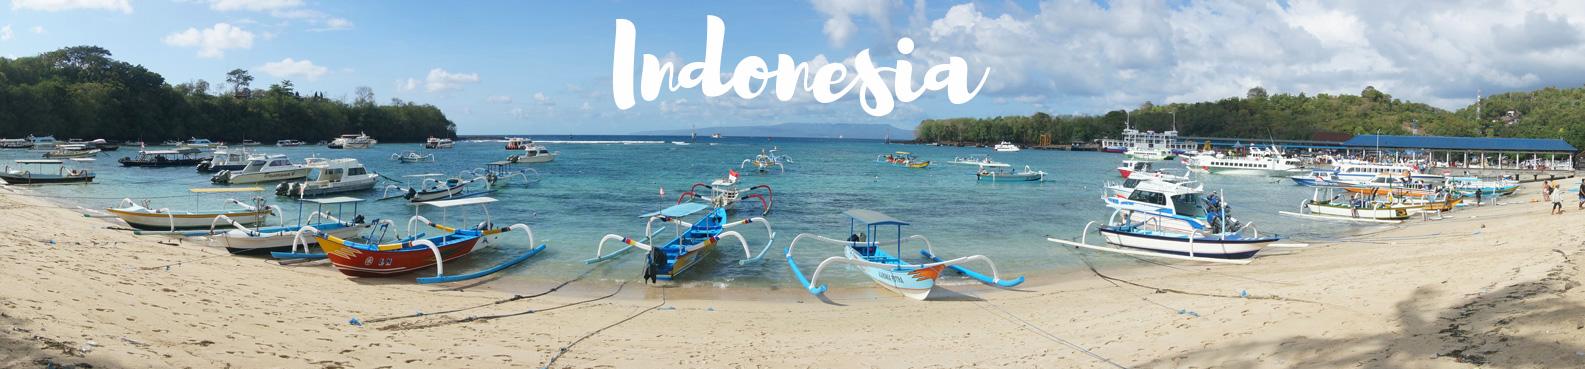 indonesian-boats